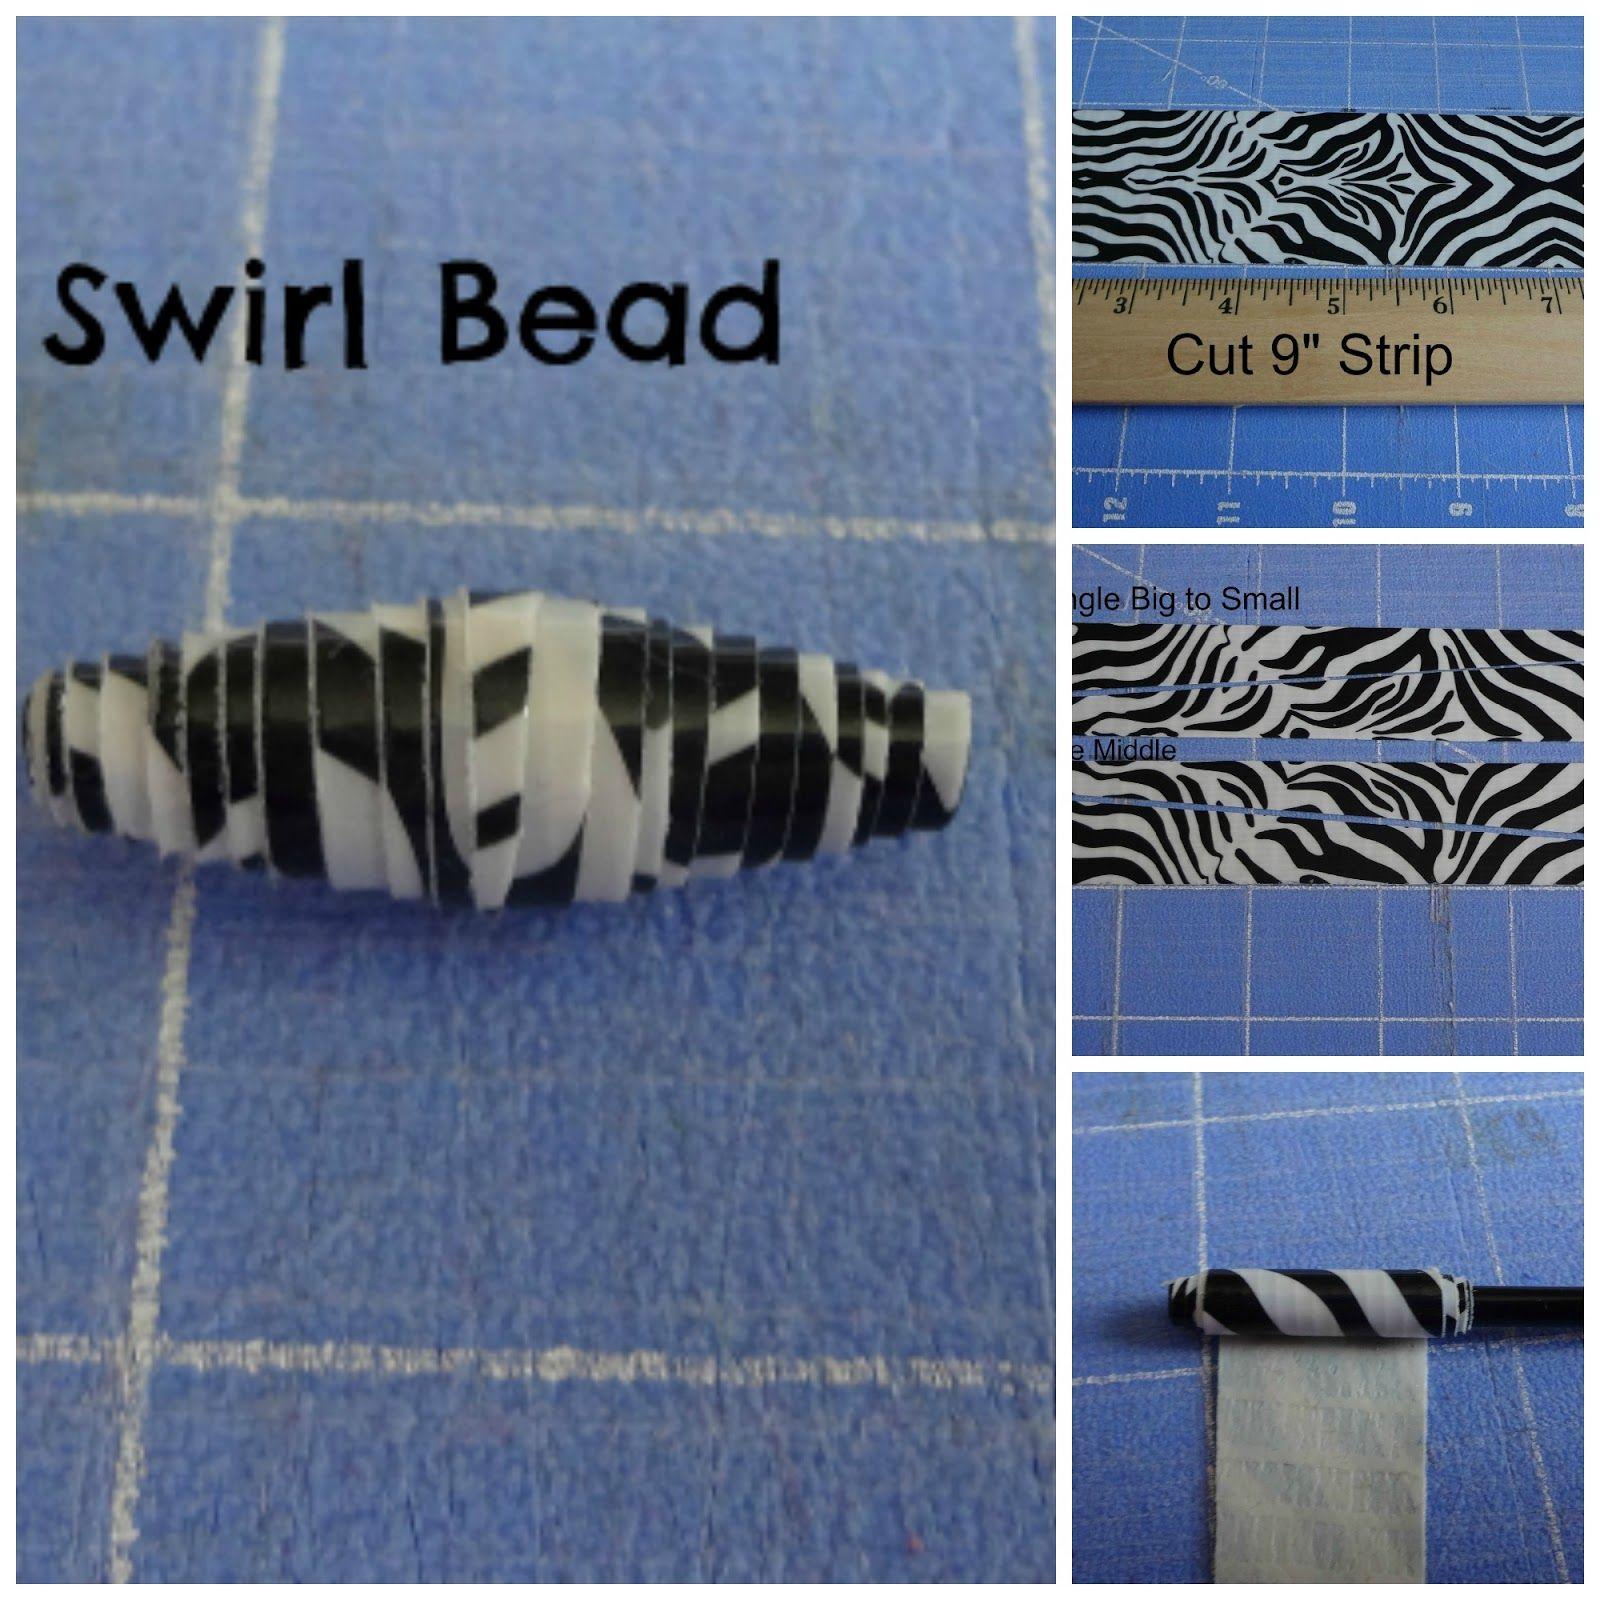 Crafty Night Owls: Duct Tape Bead Tutorial